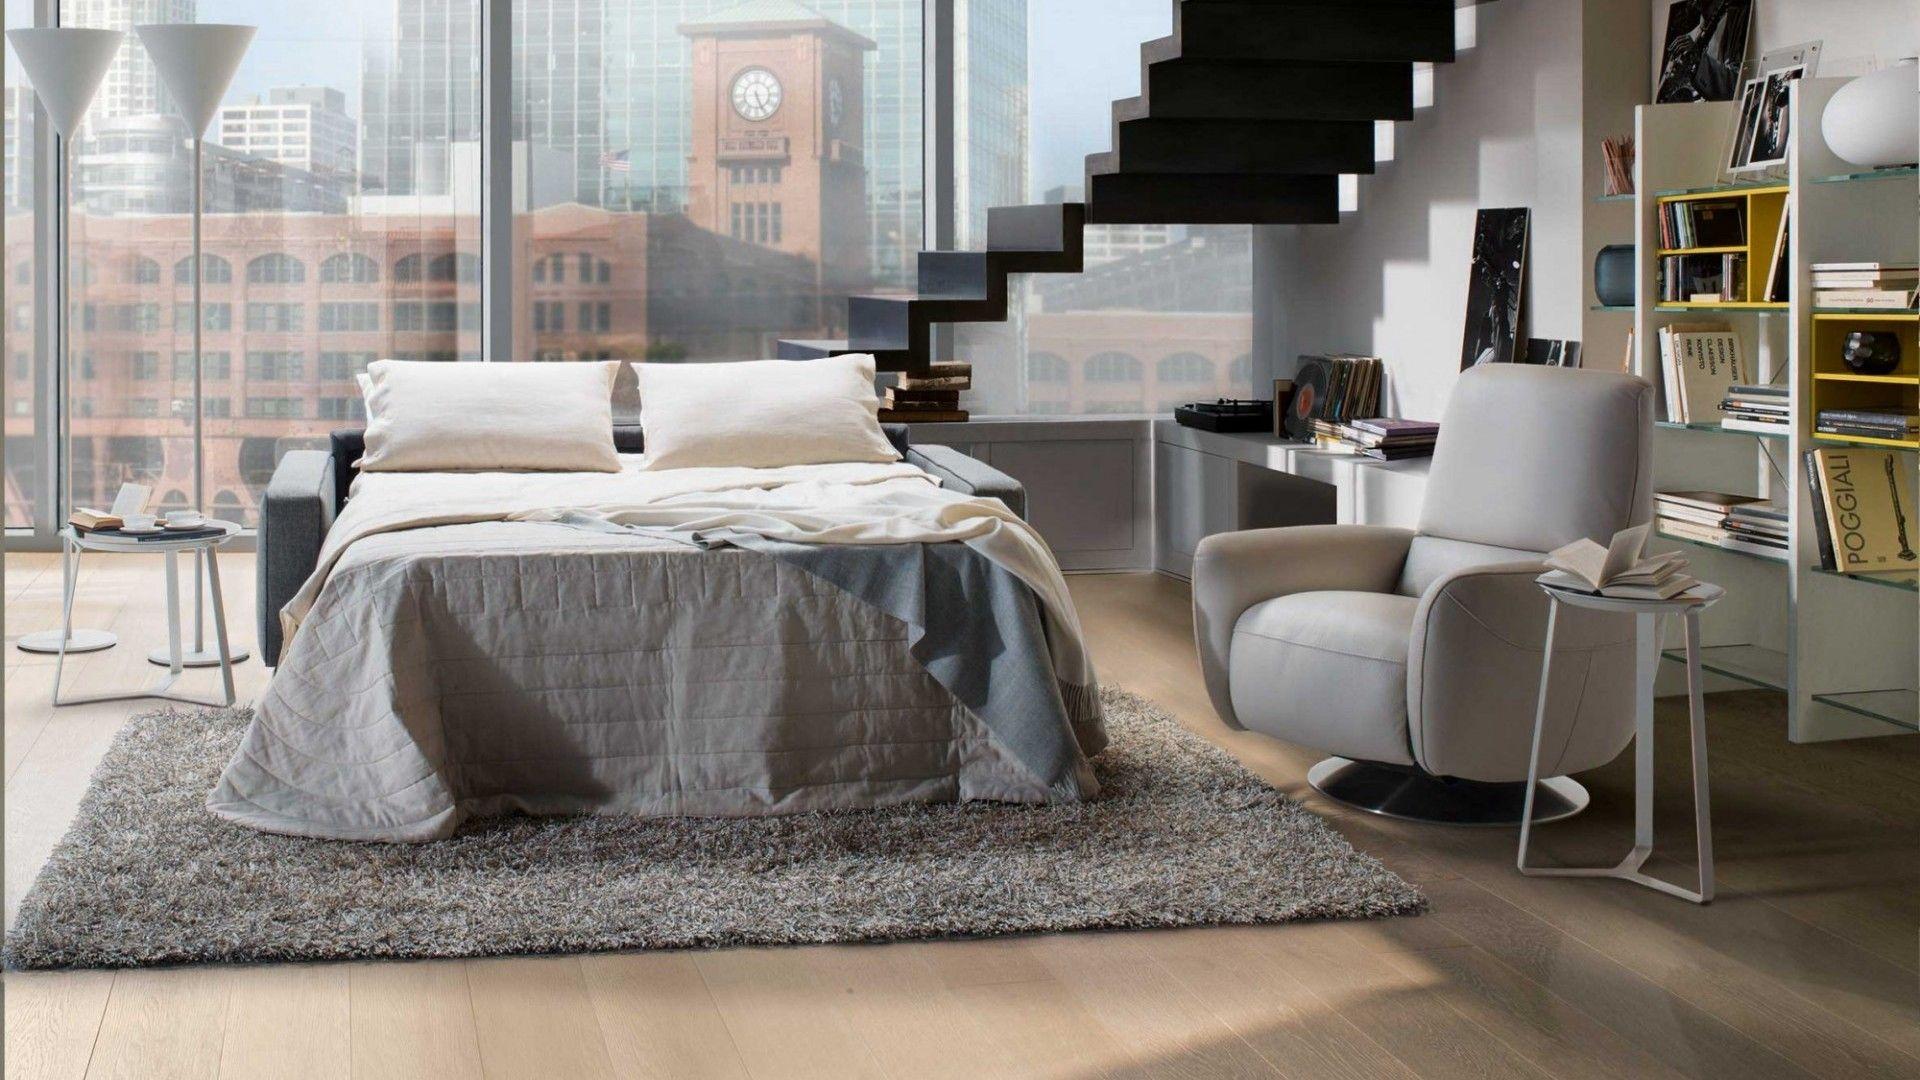 натуцци capriccio, natuzzi диван, мягкая мебель в Санкт-Петербурге, натуззи, кожа